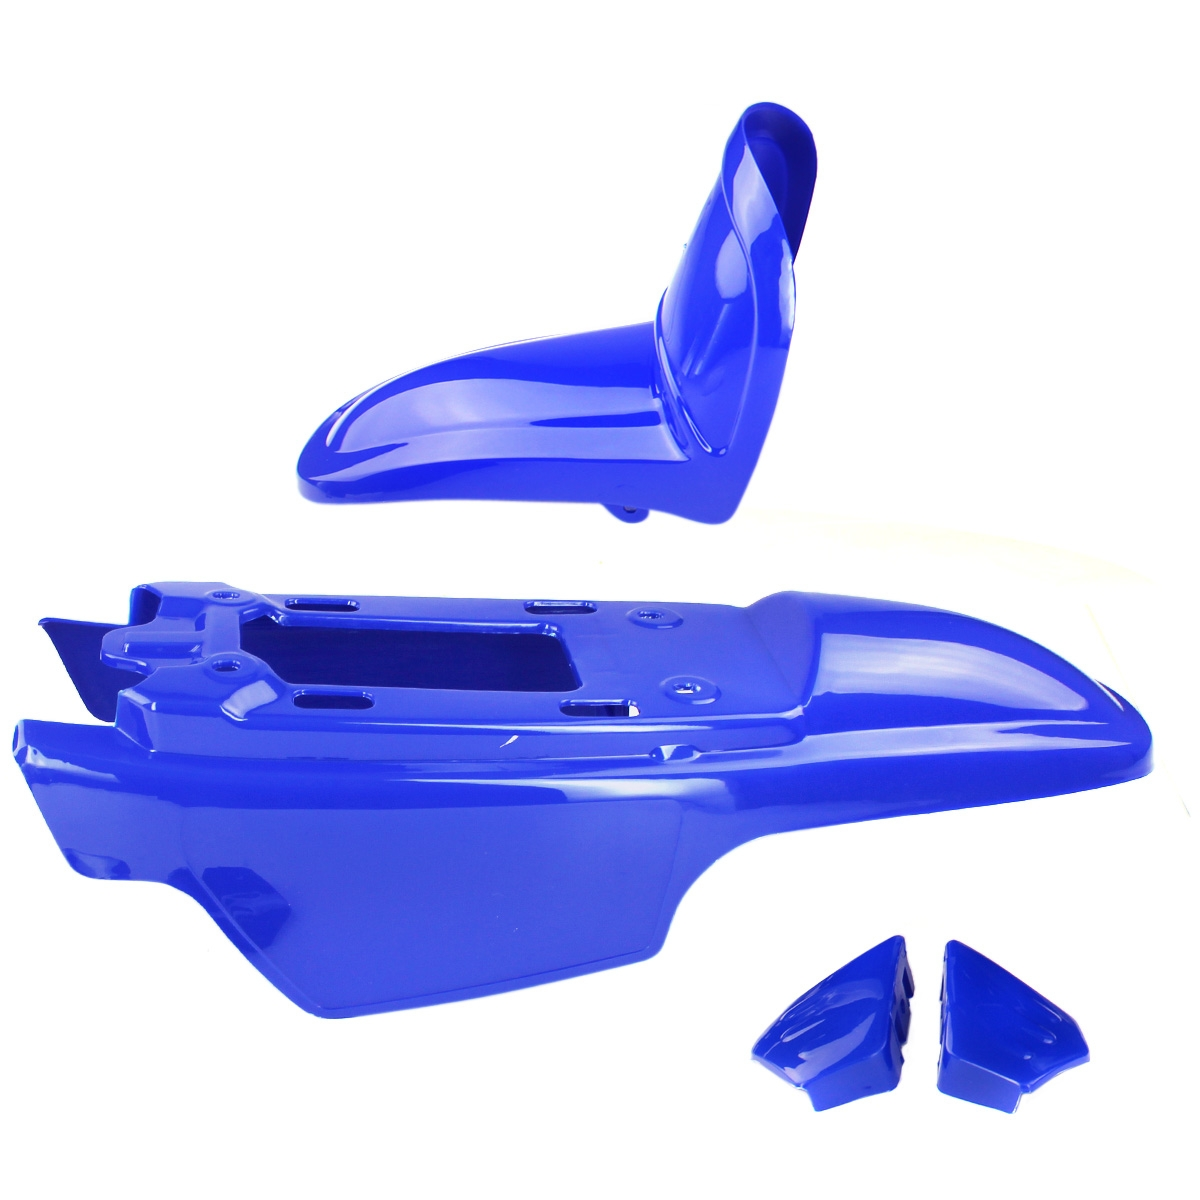 Kit habillage TNT Original bleu PW 50